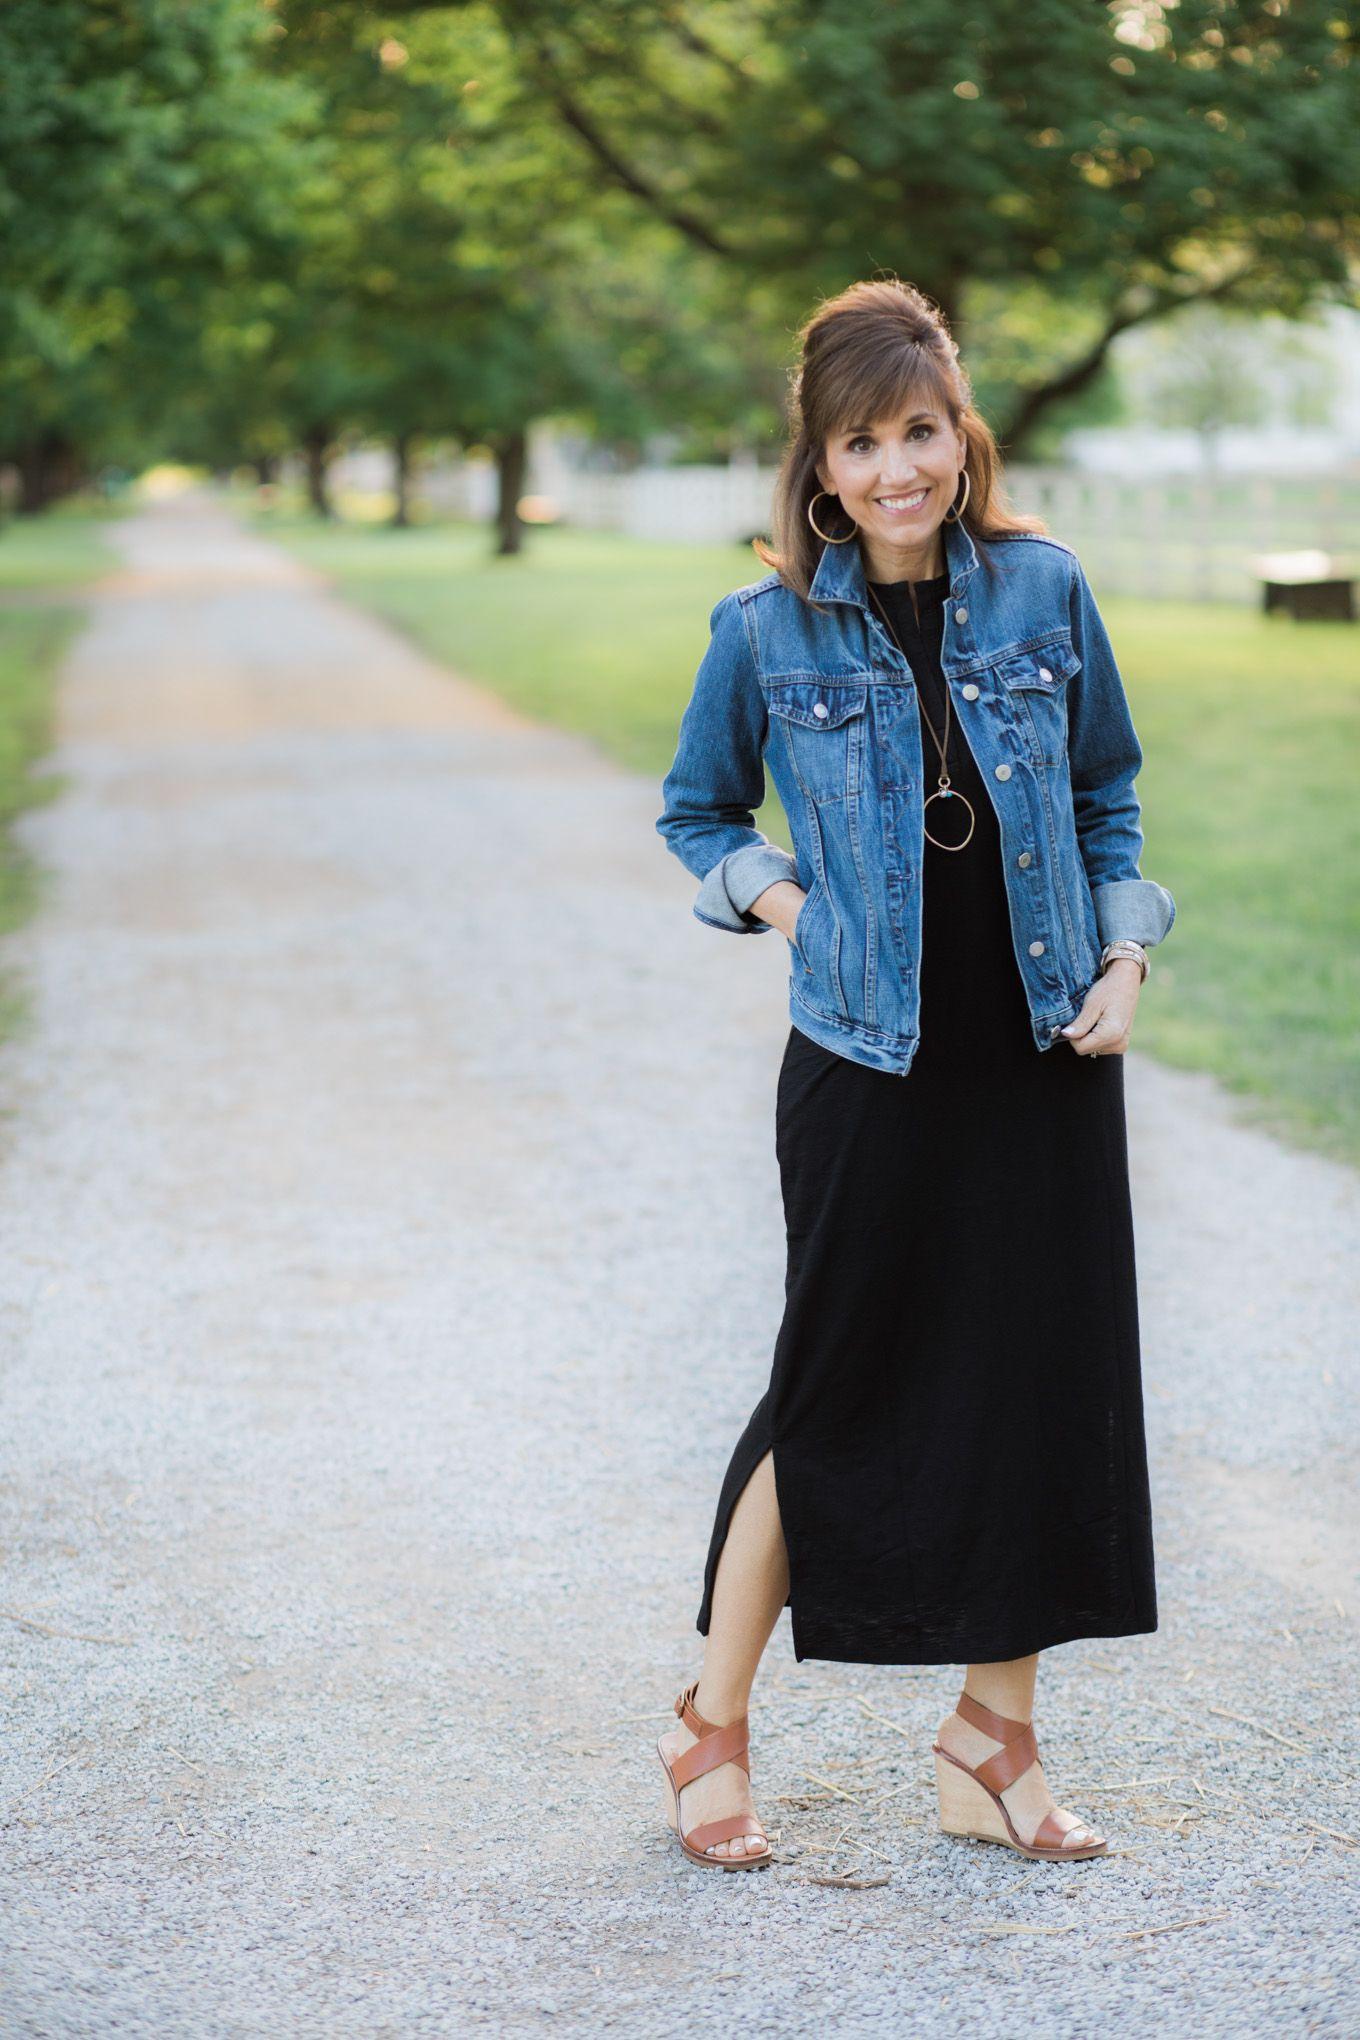 Black Maxi Dress + Denim Jacket | Moda moldes, Looks vestido